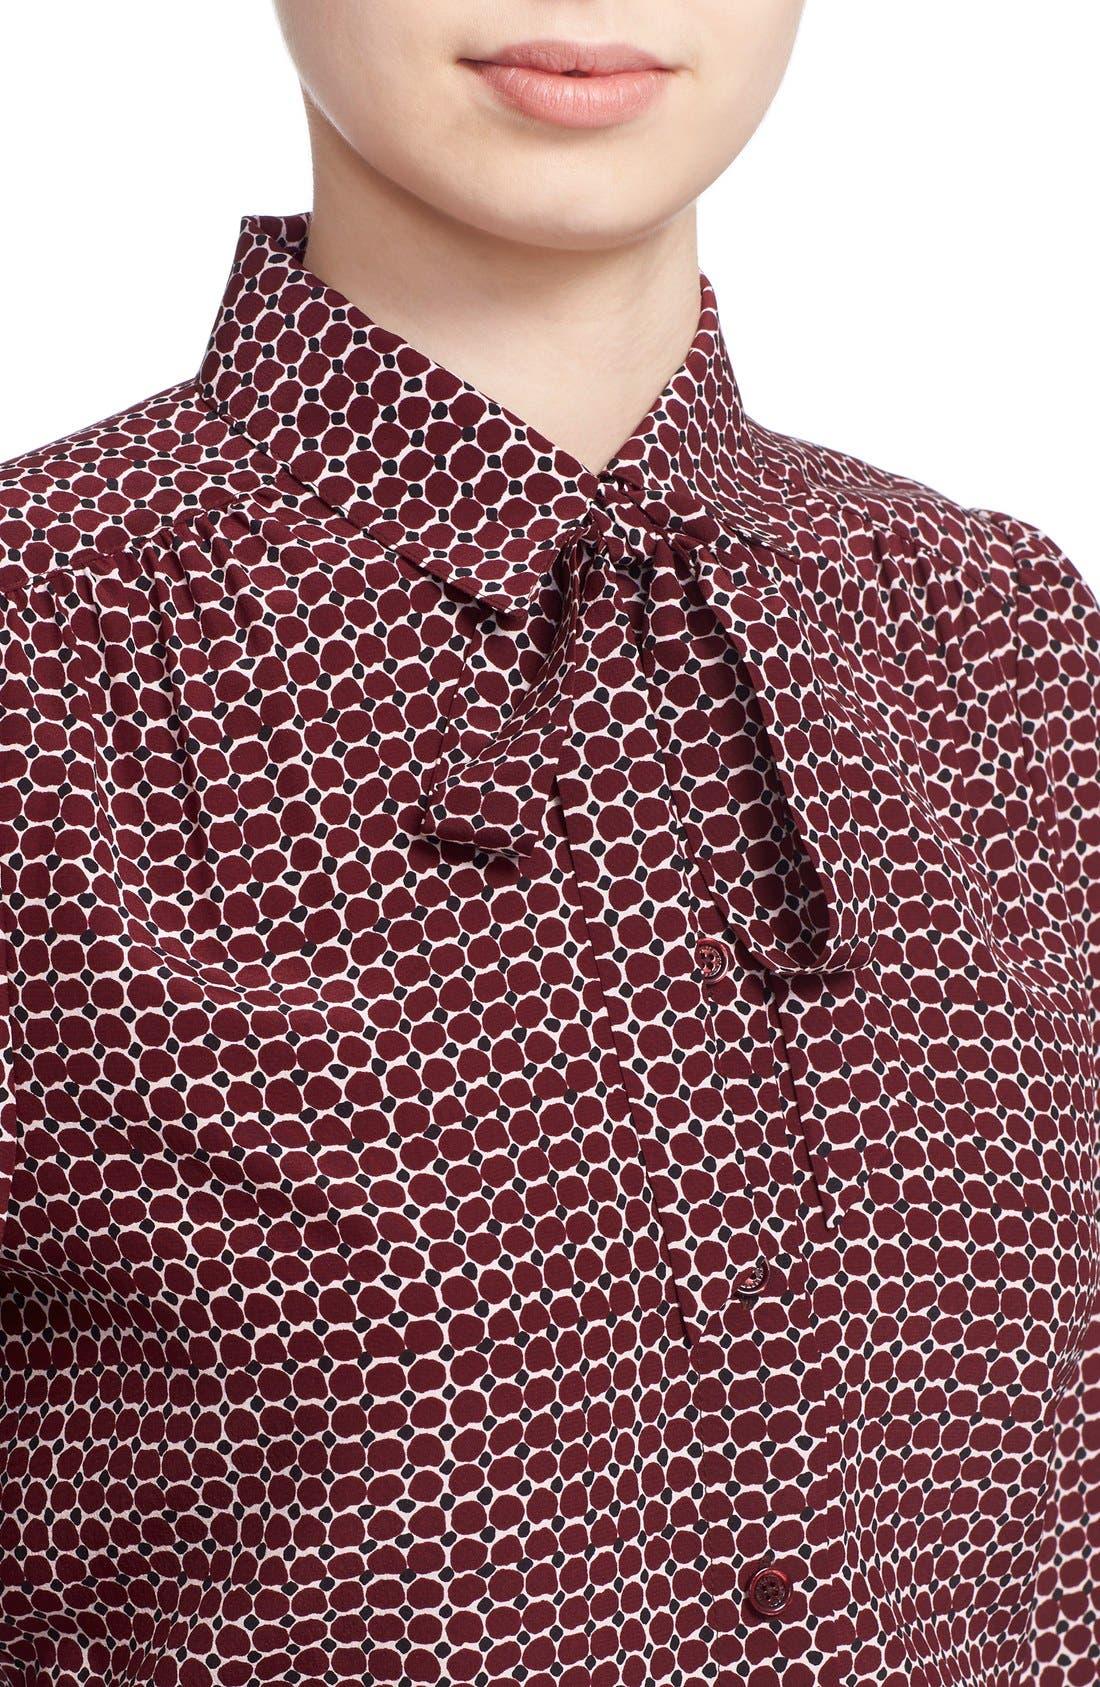 Alternate Image 4  - kate spade new york 'parker dot' print silk bow blouse